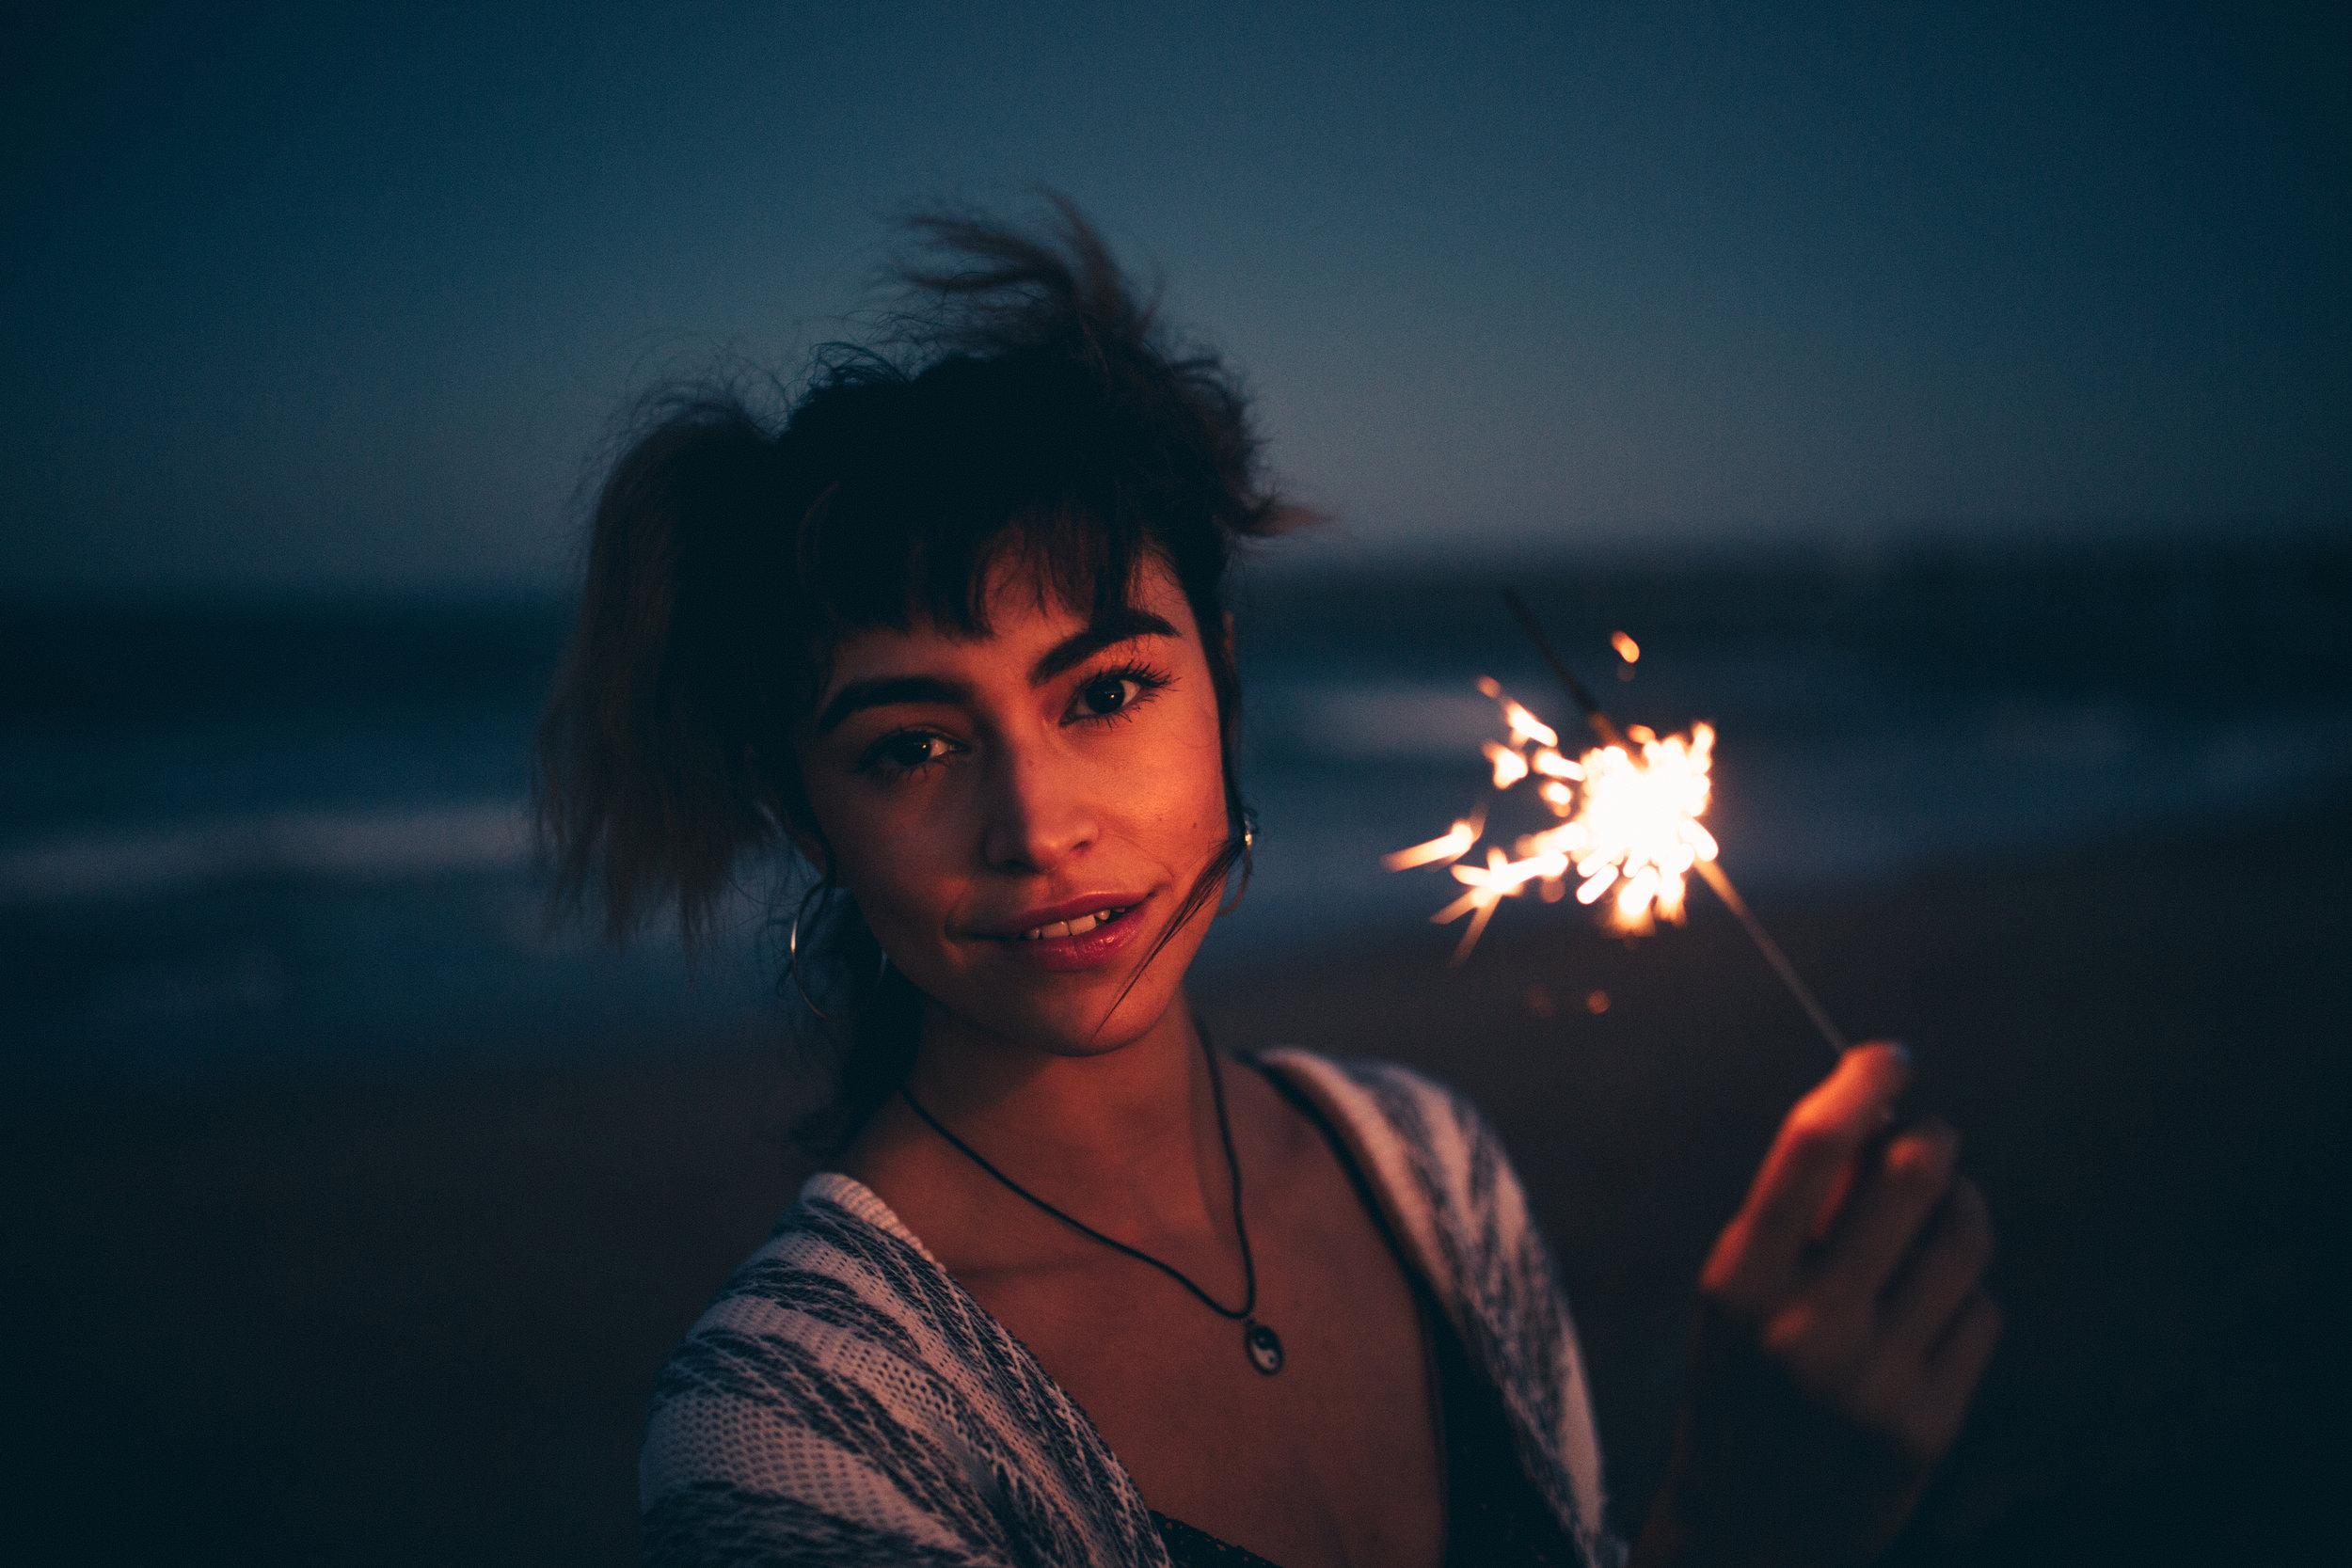 florida-flagler-beach-sparklers-photographer-ocean